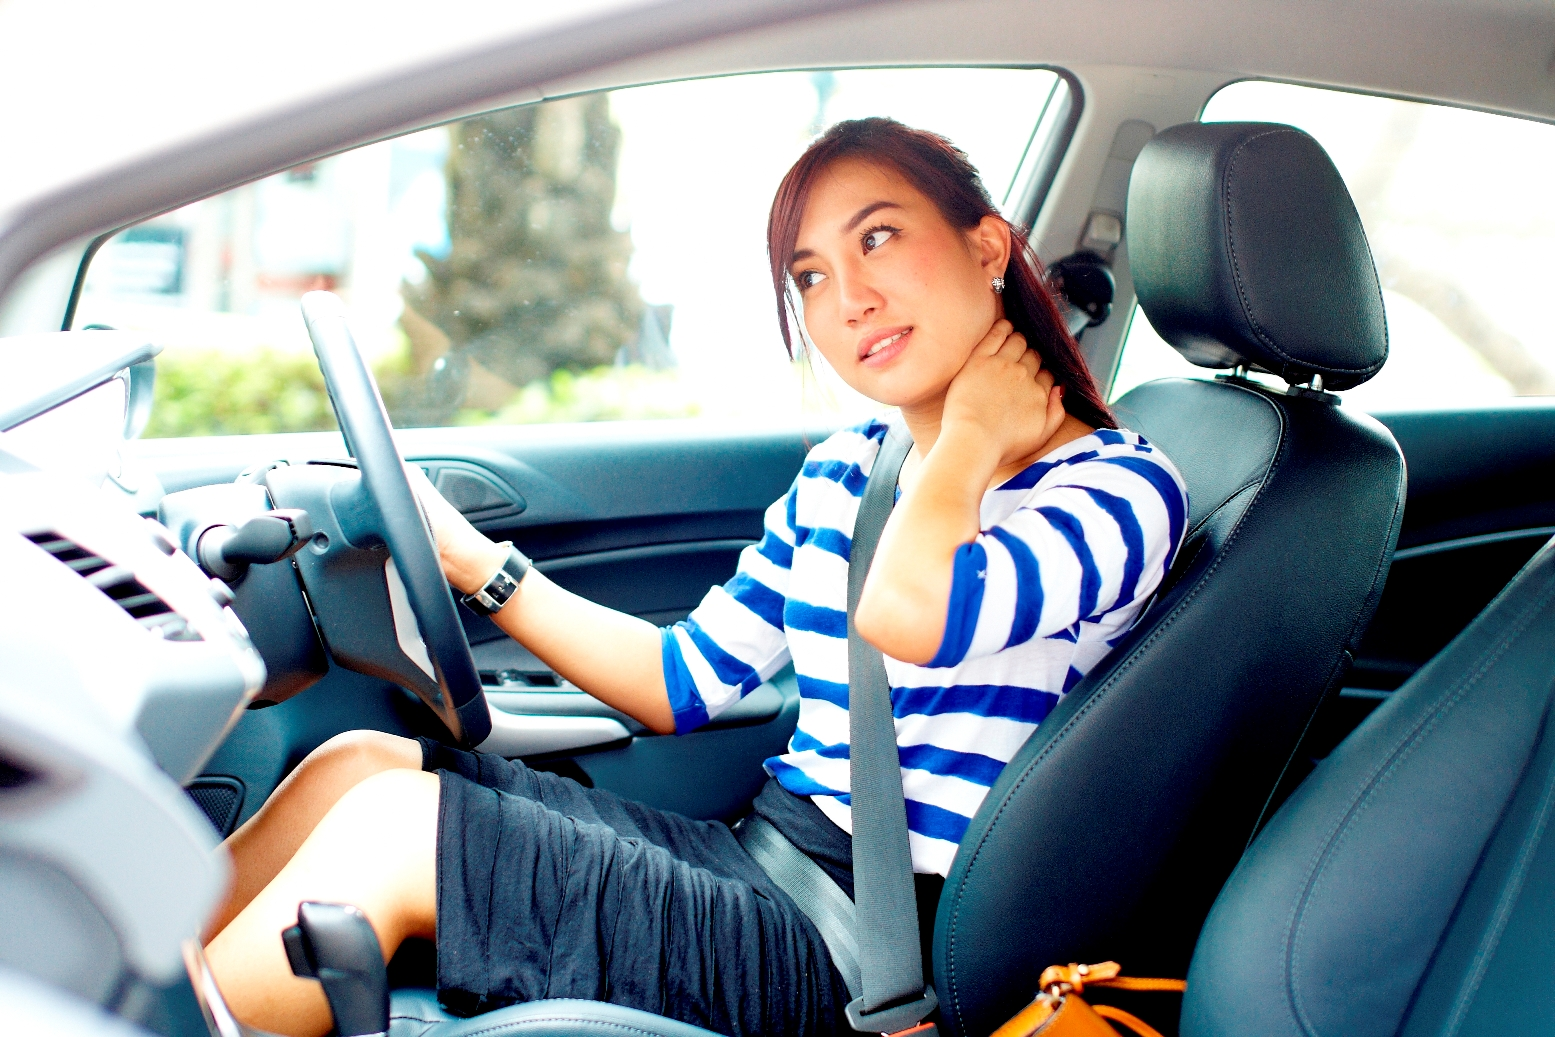 Ford tips & tricks: Car yoga